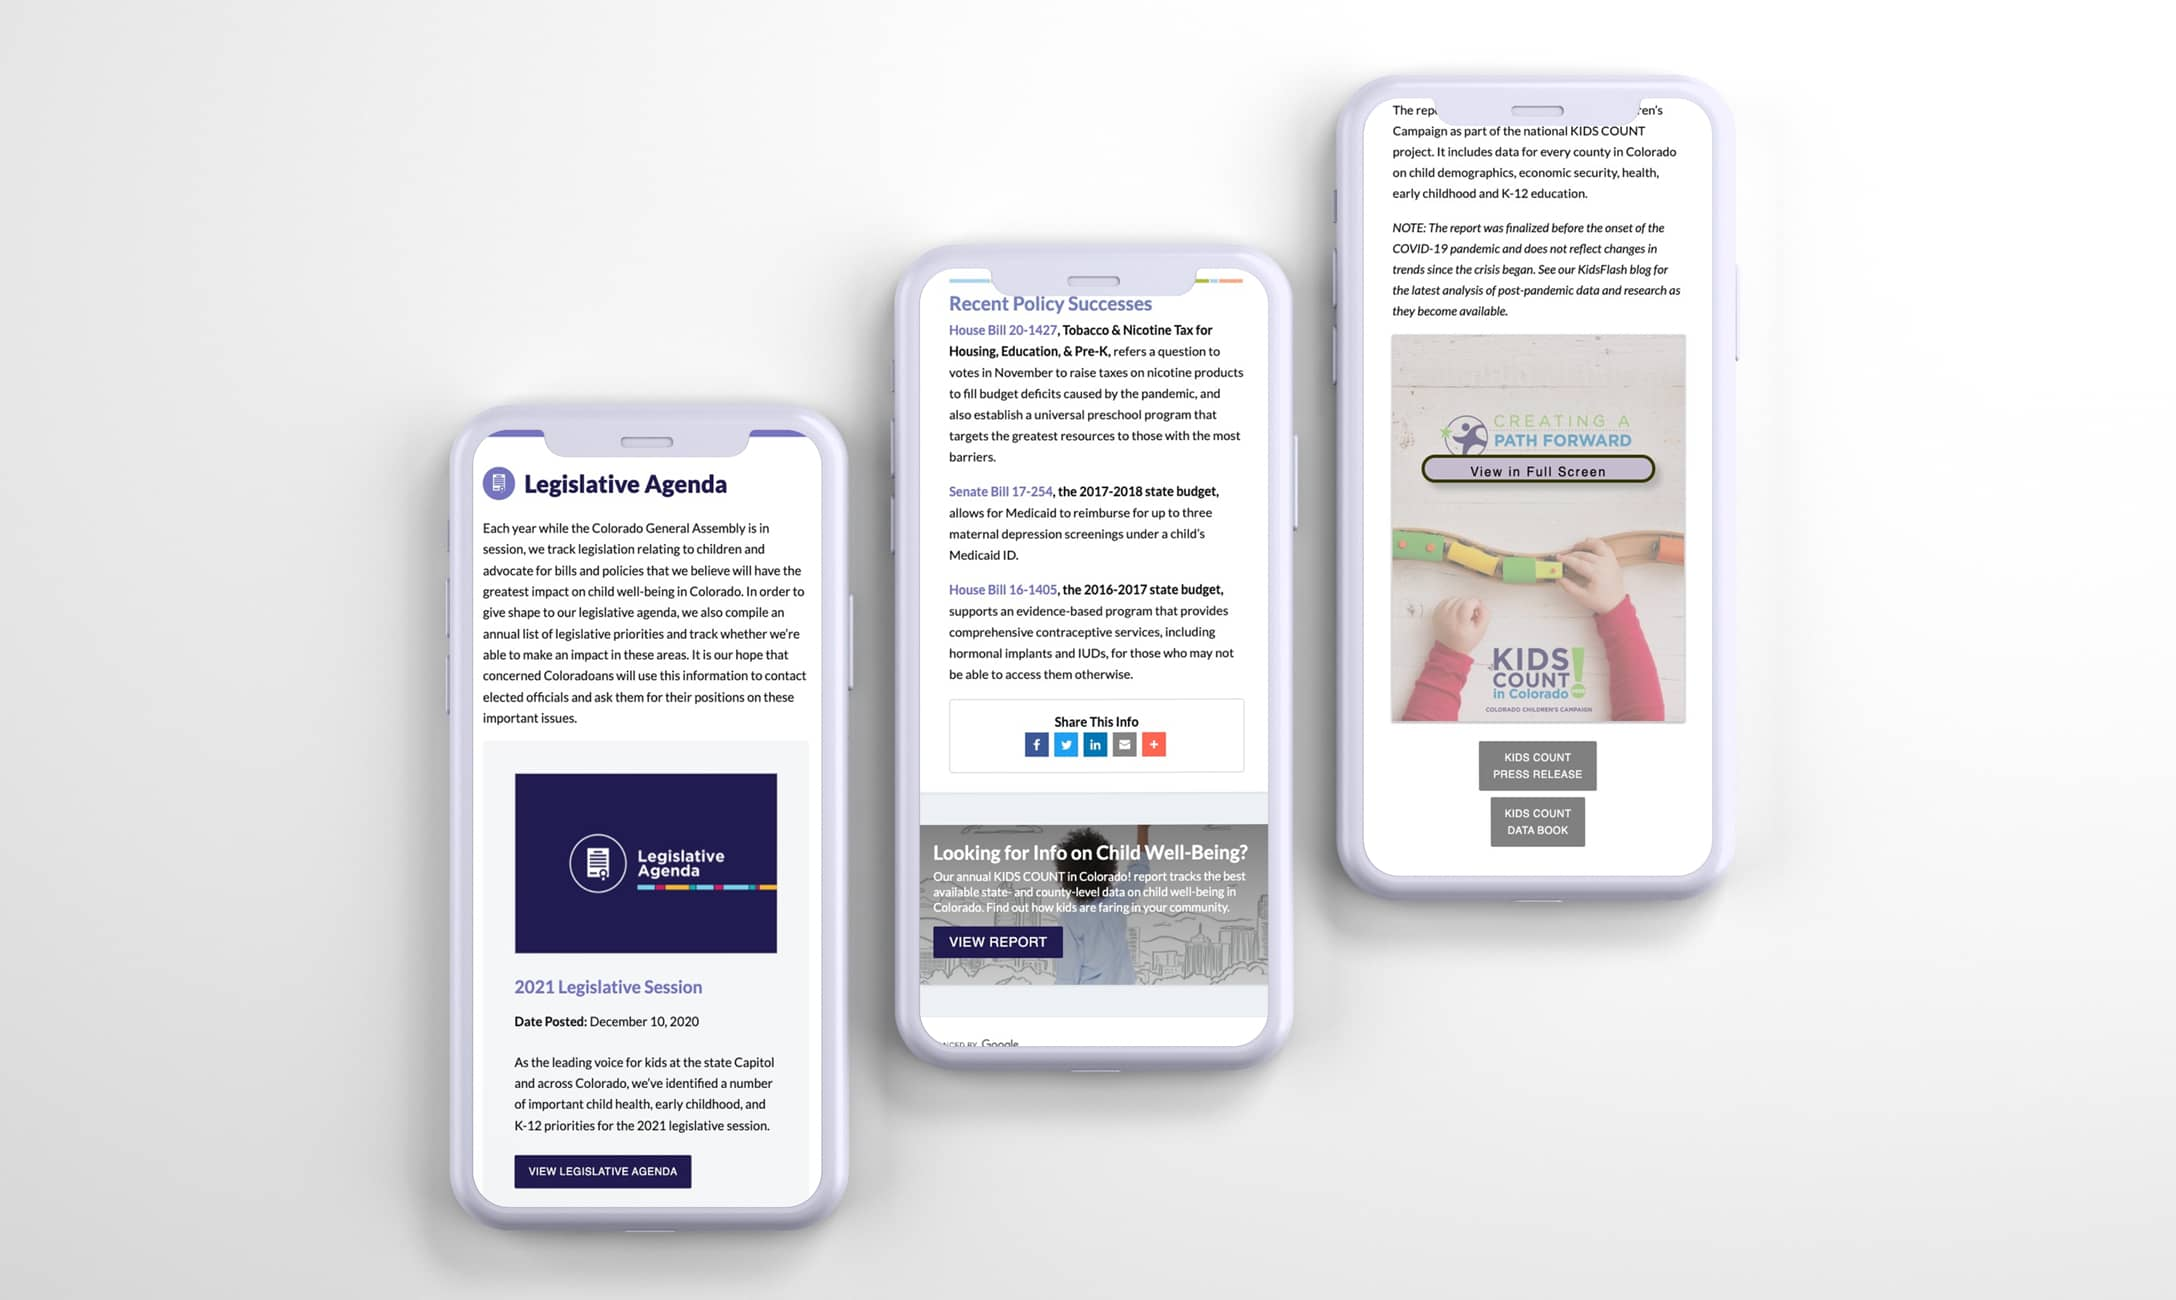 Colorado-Childrens-Campaign-Portfolio-on-mobile-phones